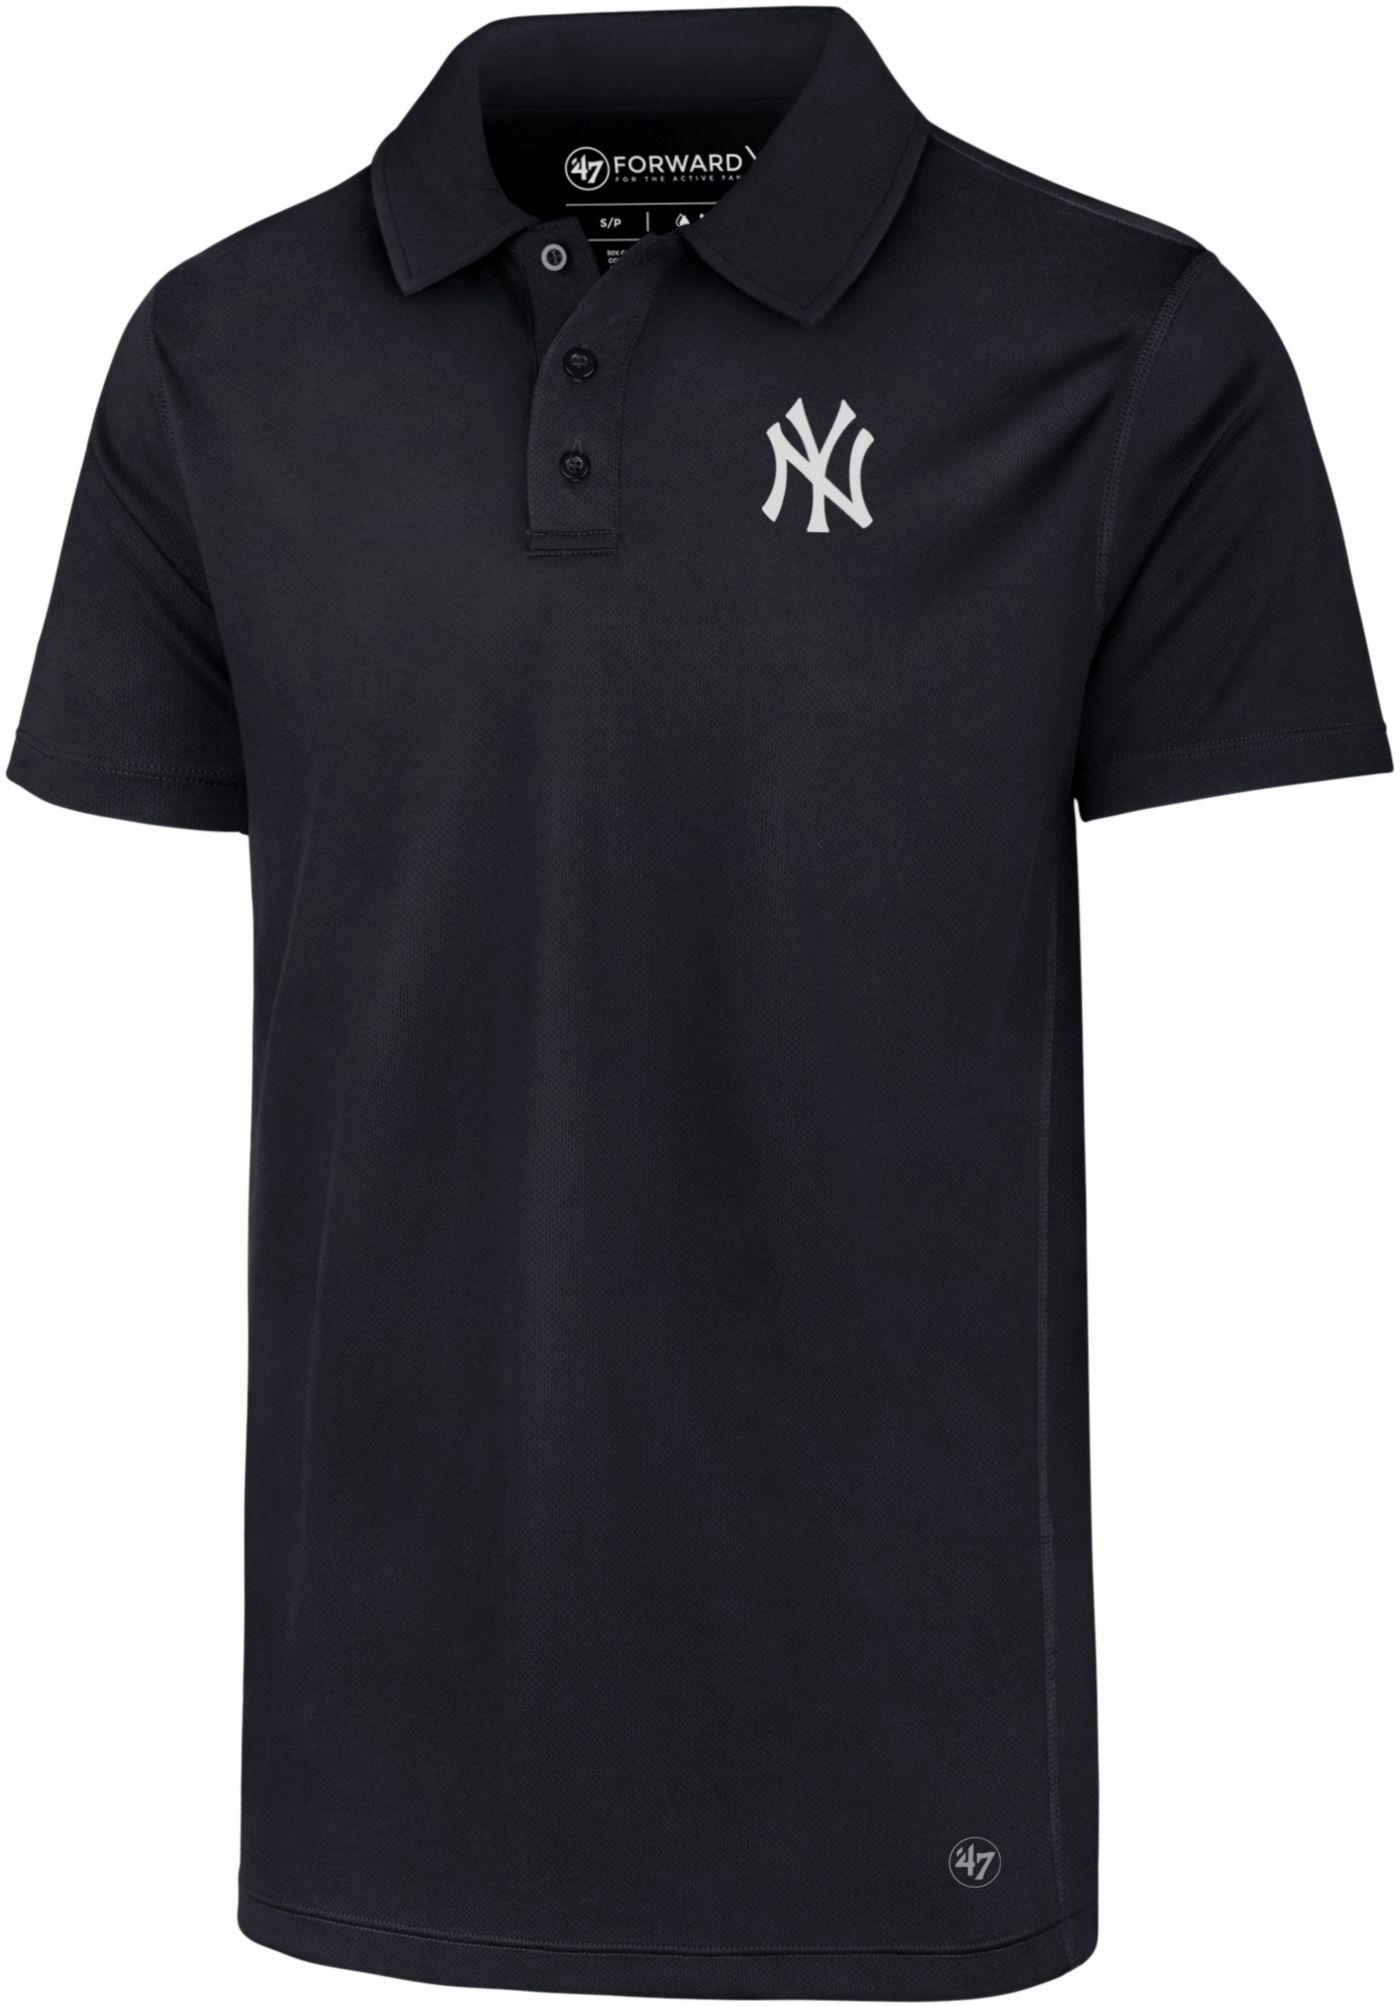 '47 Men's New York Yankees Ace Polo